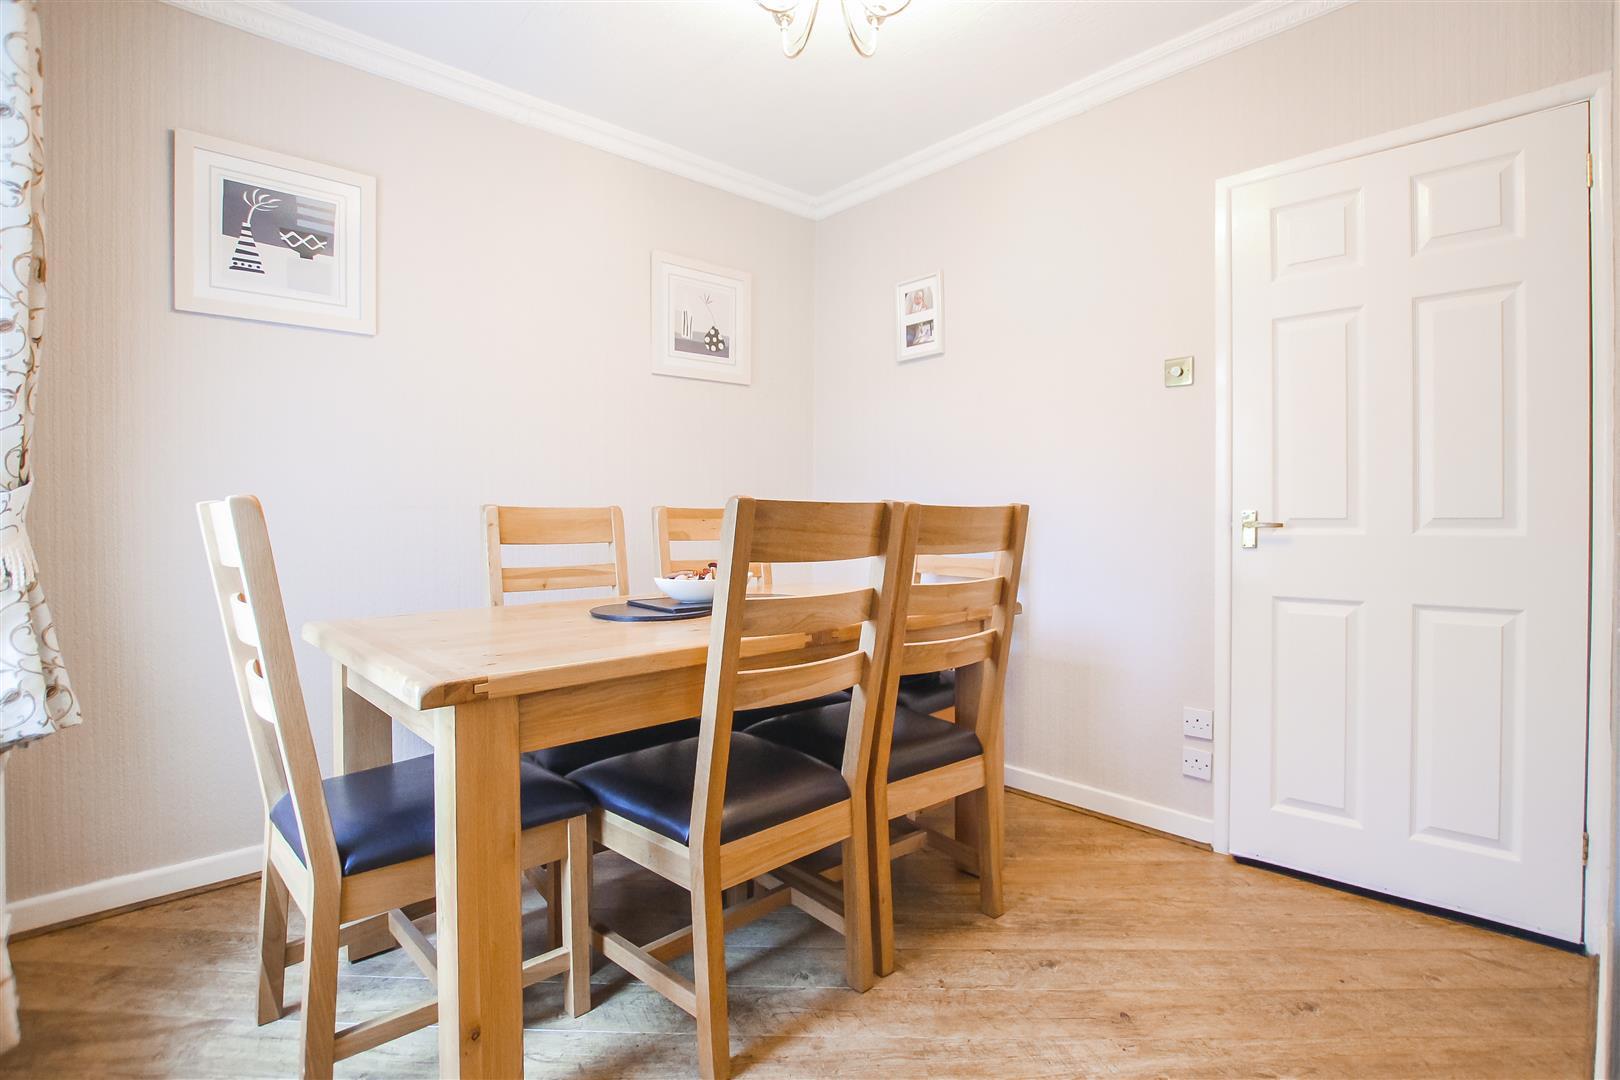 3 Bedroom Detached Bungalow For Sale - Dining Room